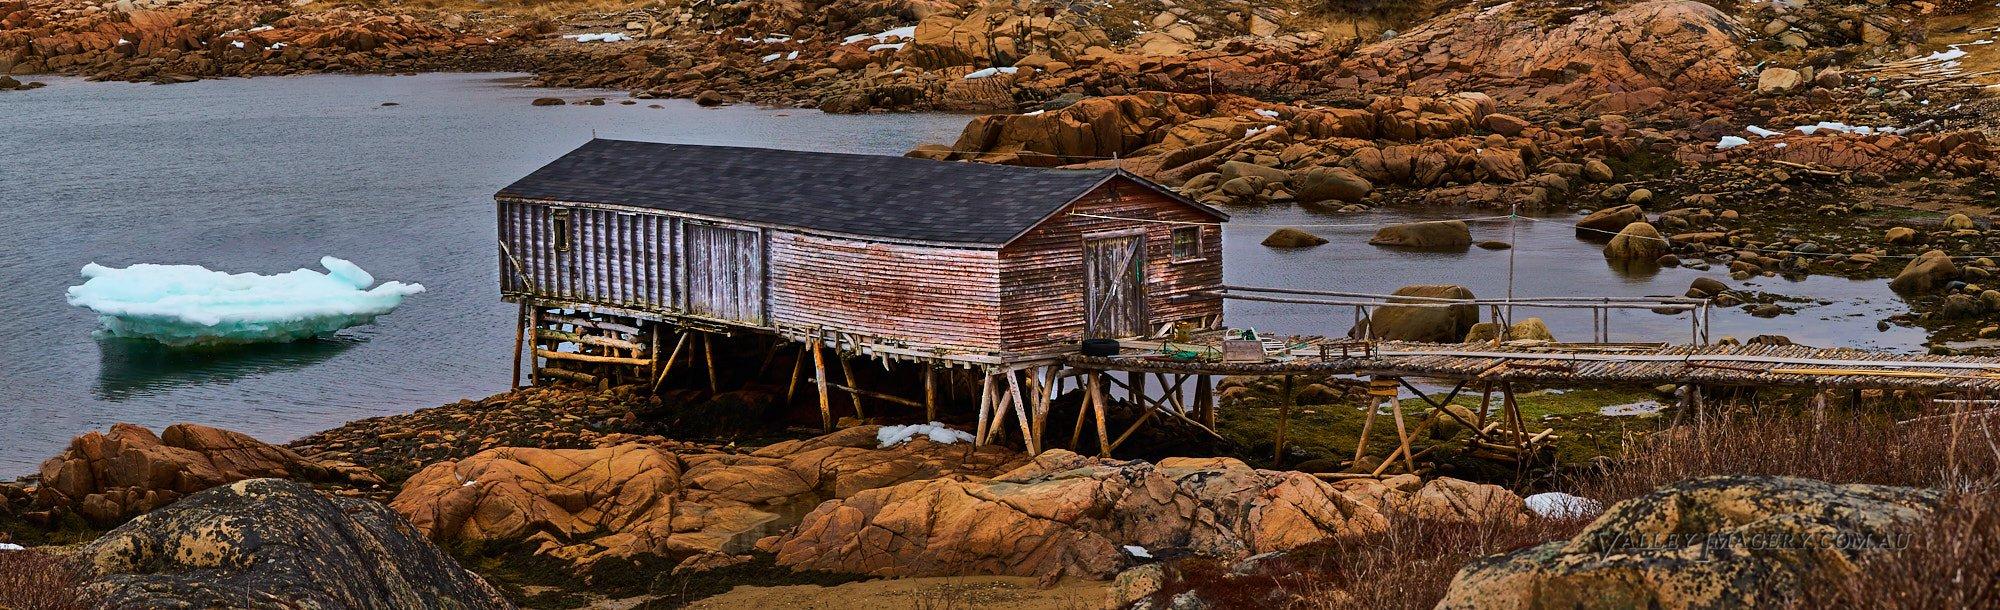 Fishing Stage Newfoundland Canada